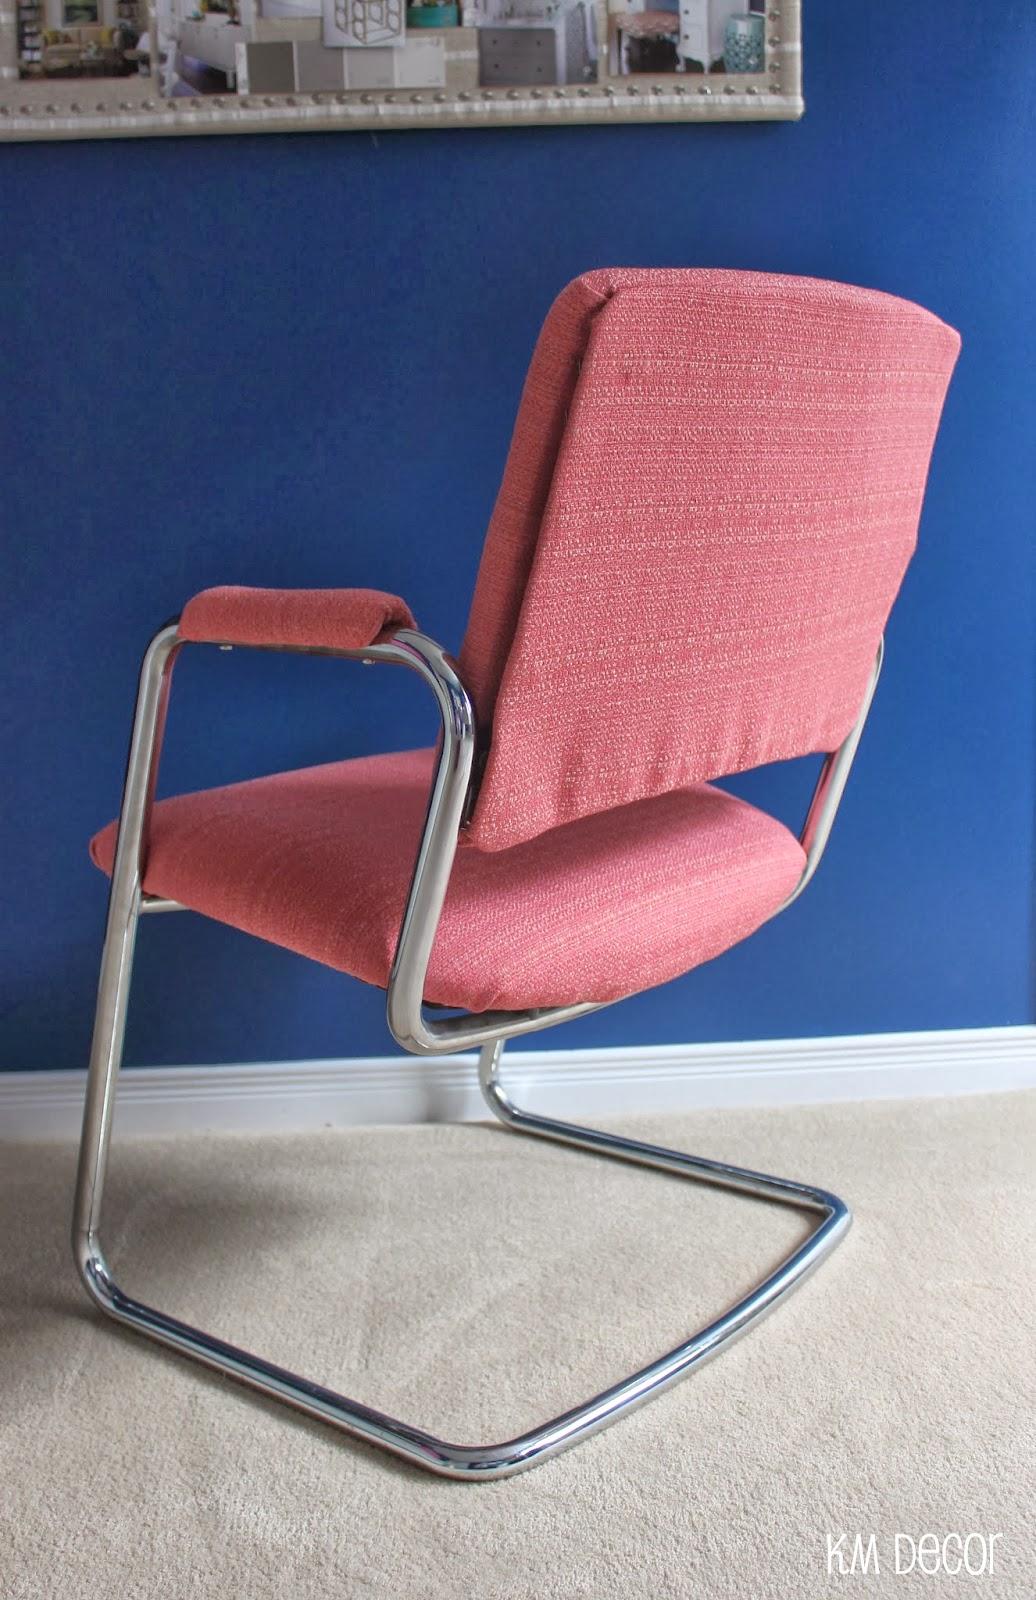 Desk Chair Diy Bean Bag Covers Walmart Km Decor Office Makeover